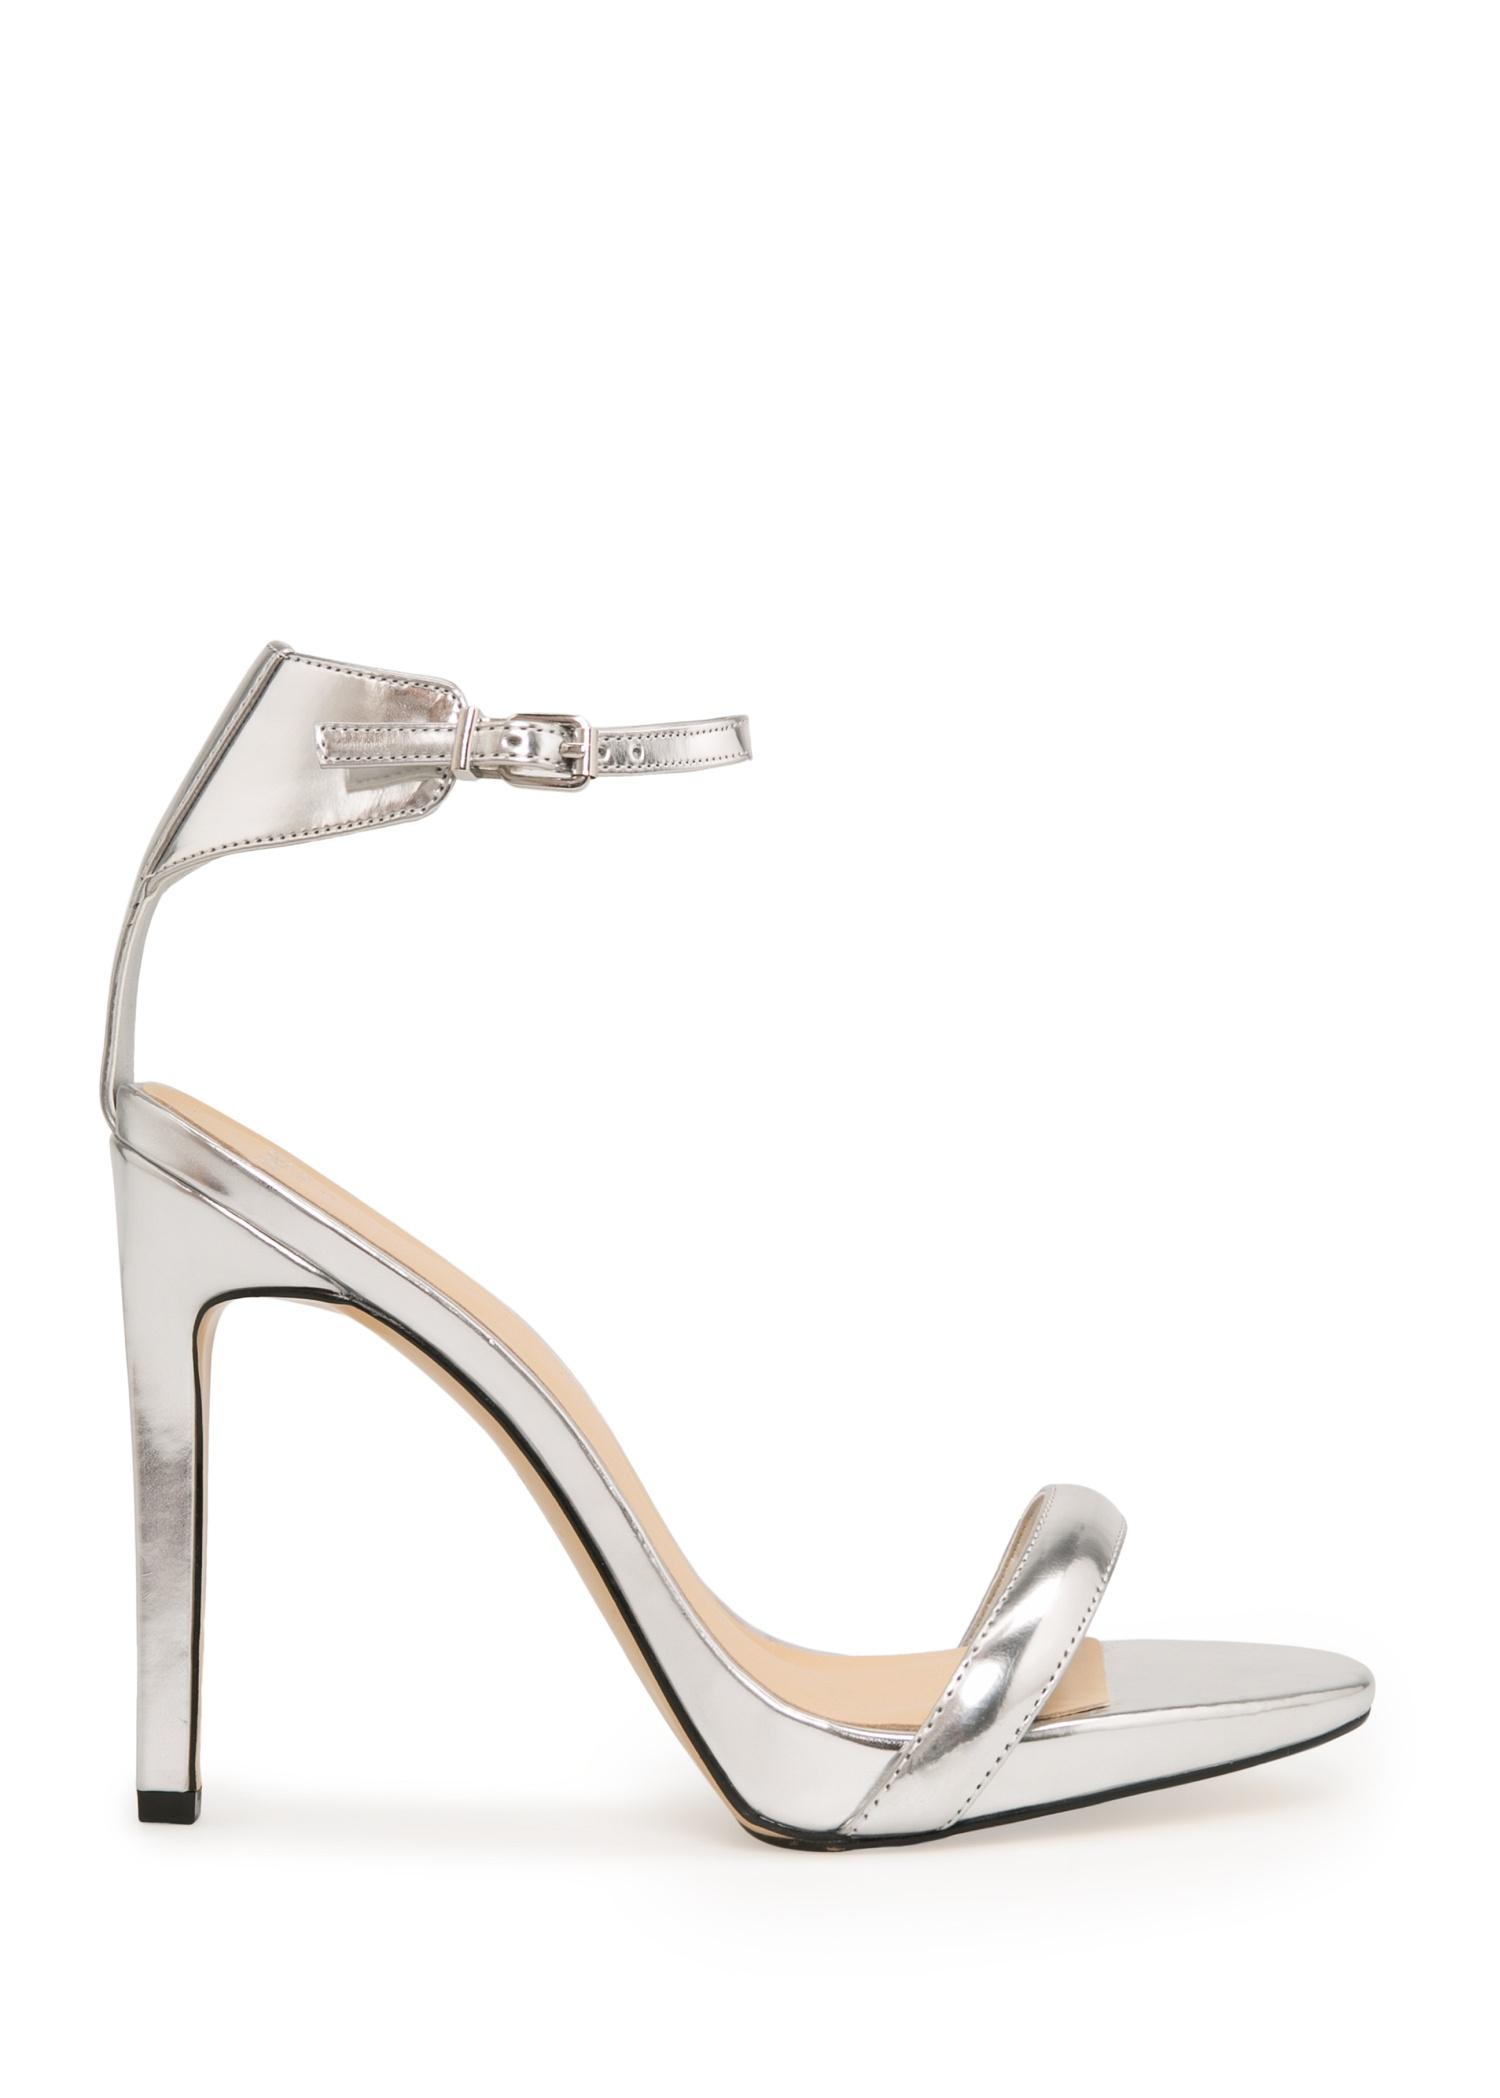 91a5a108200 Lyst - Mango Stiletto Heel Sandals in Metallic